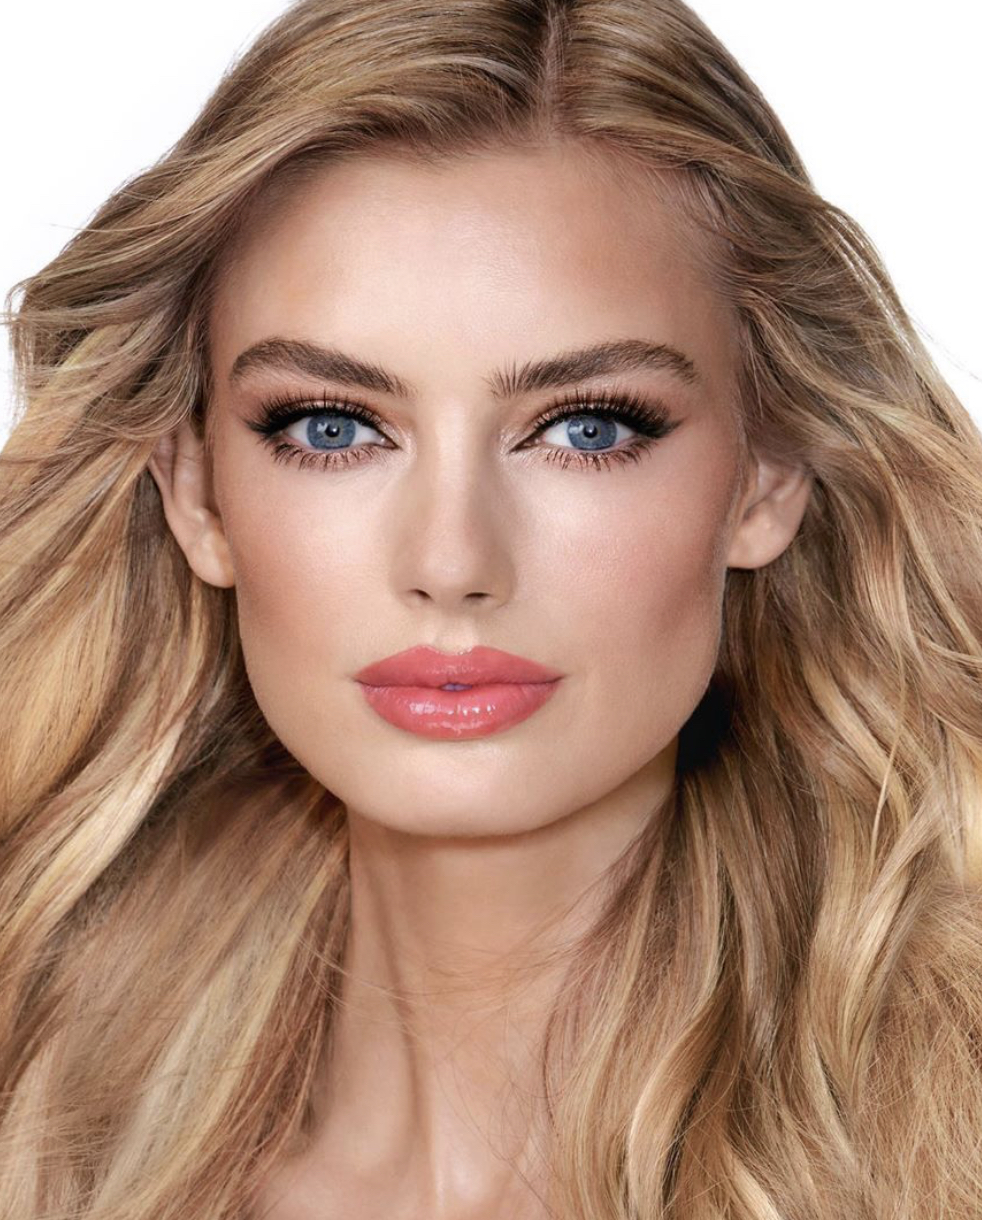 Charlotte Tilbury The Supermodel Look